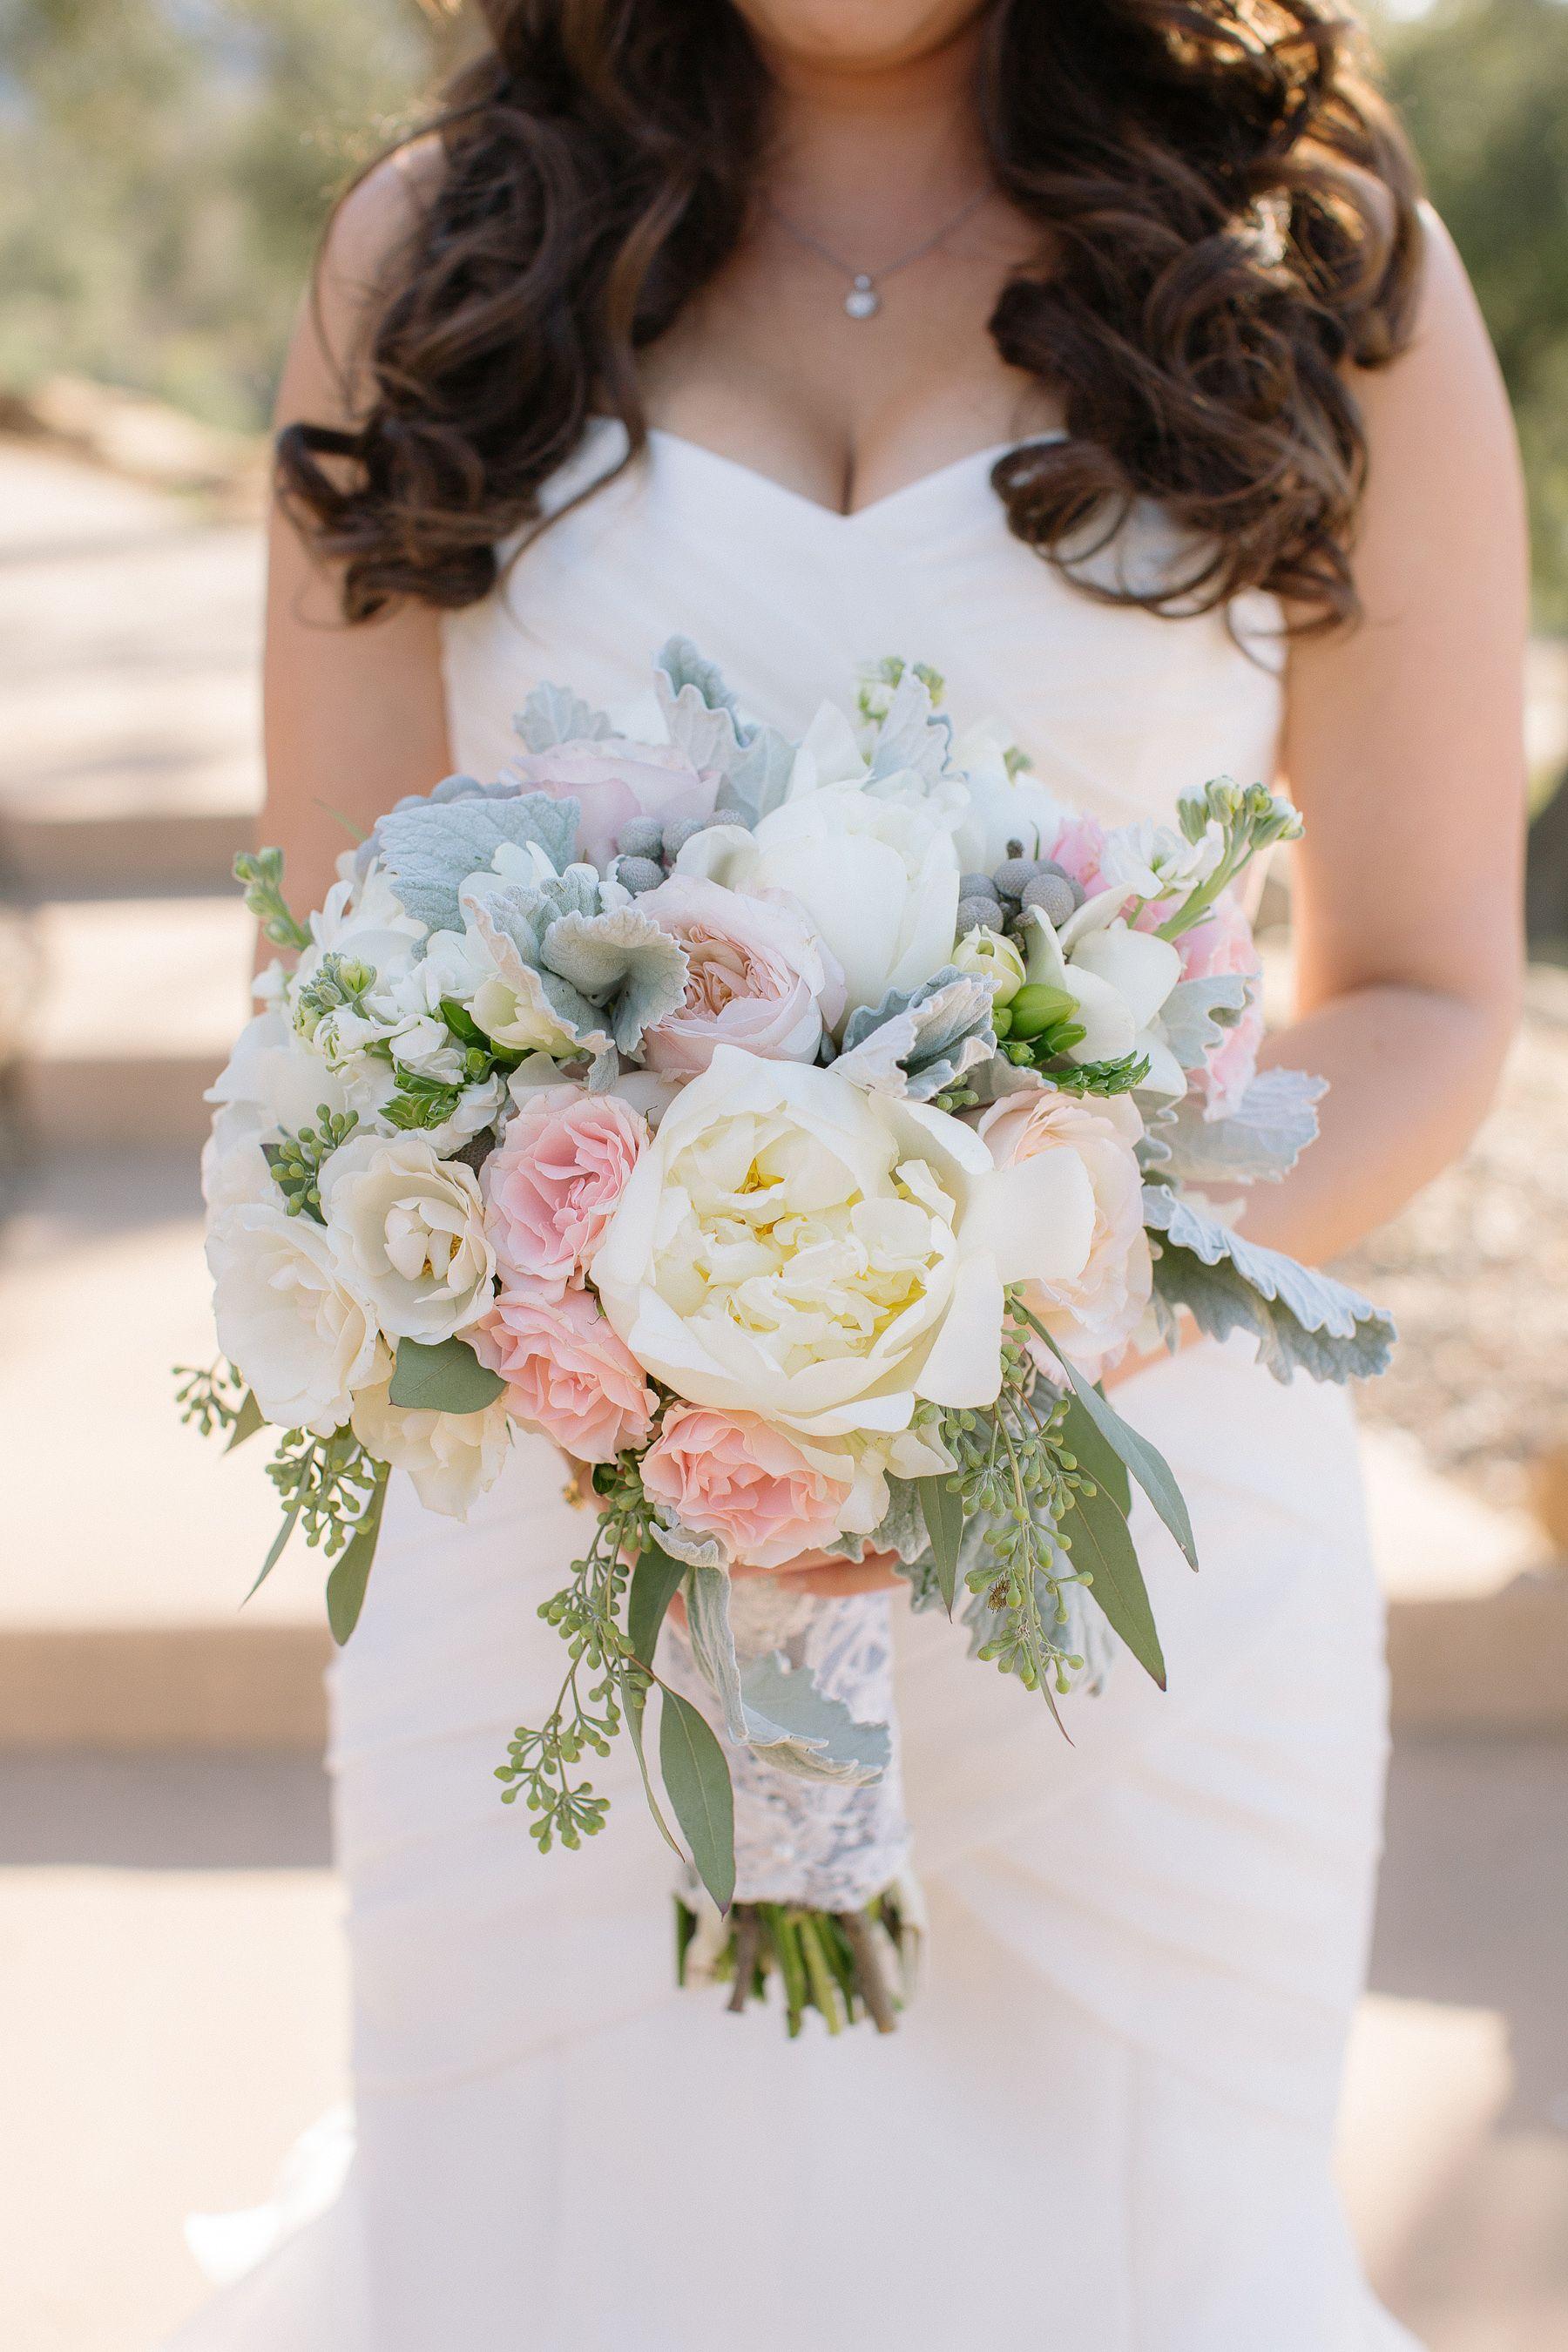 22+ Pastel colors wedding motif ideas in 2021